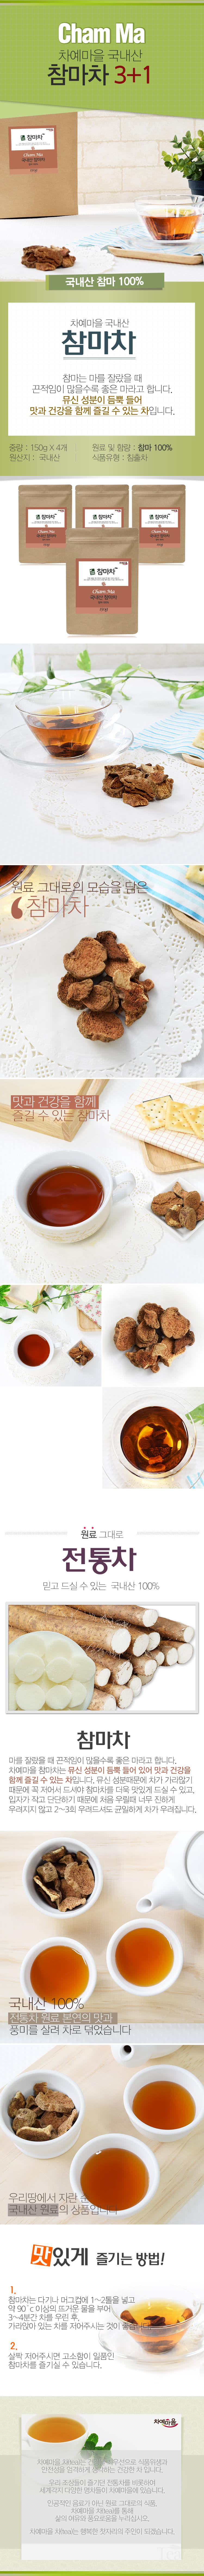 [ AndongWhiteLotus ] [ChayeTown]Korean Yam Tea 150g 3+1pcs